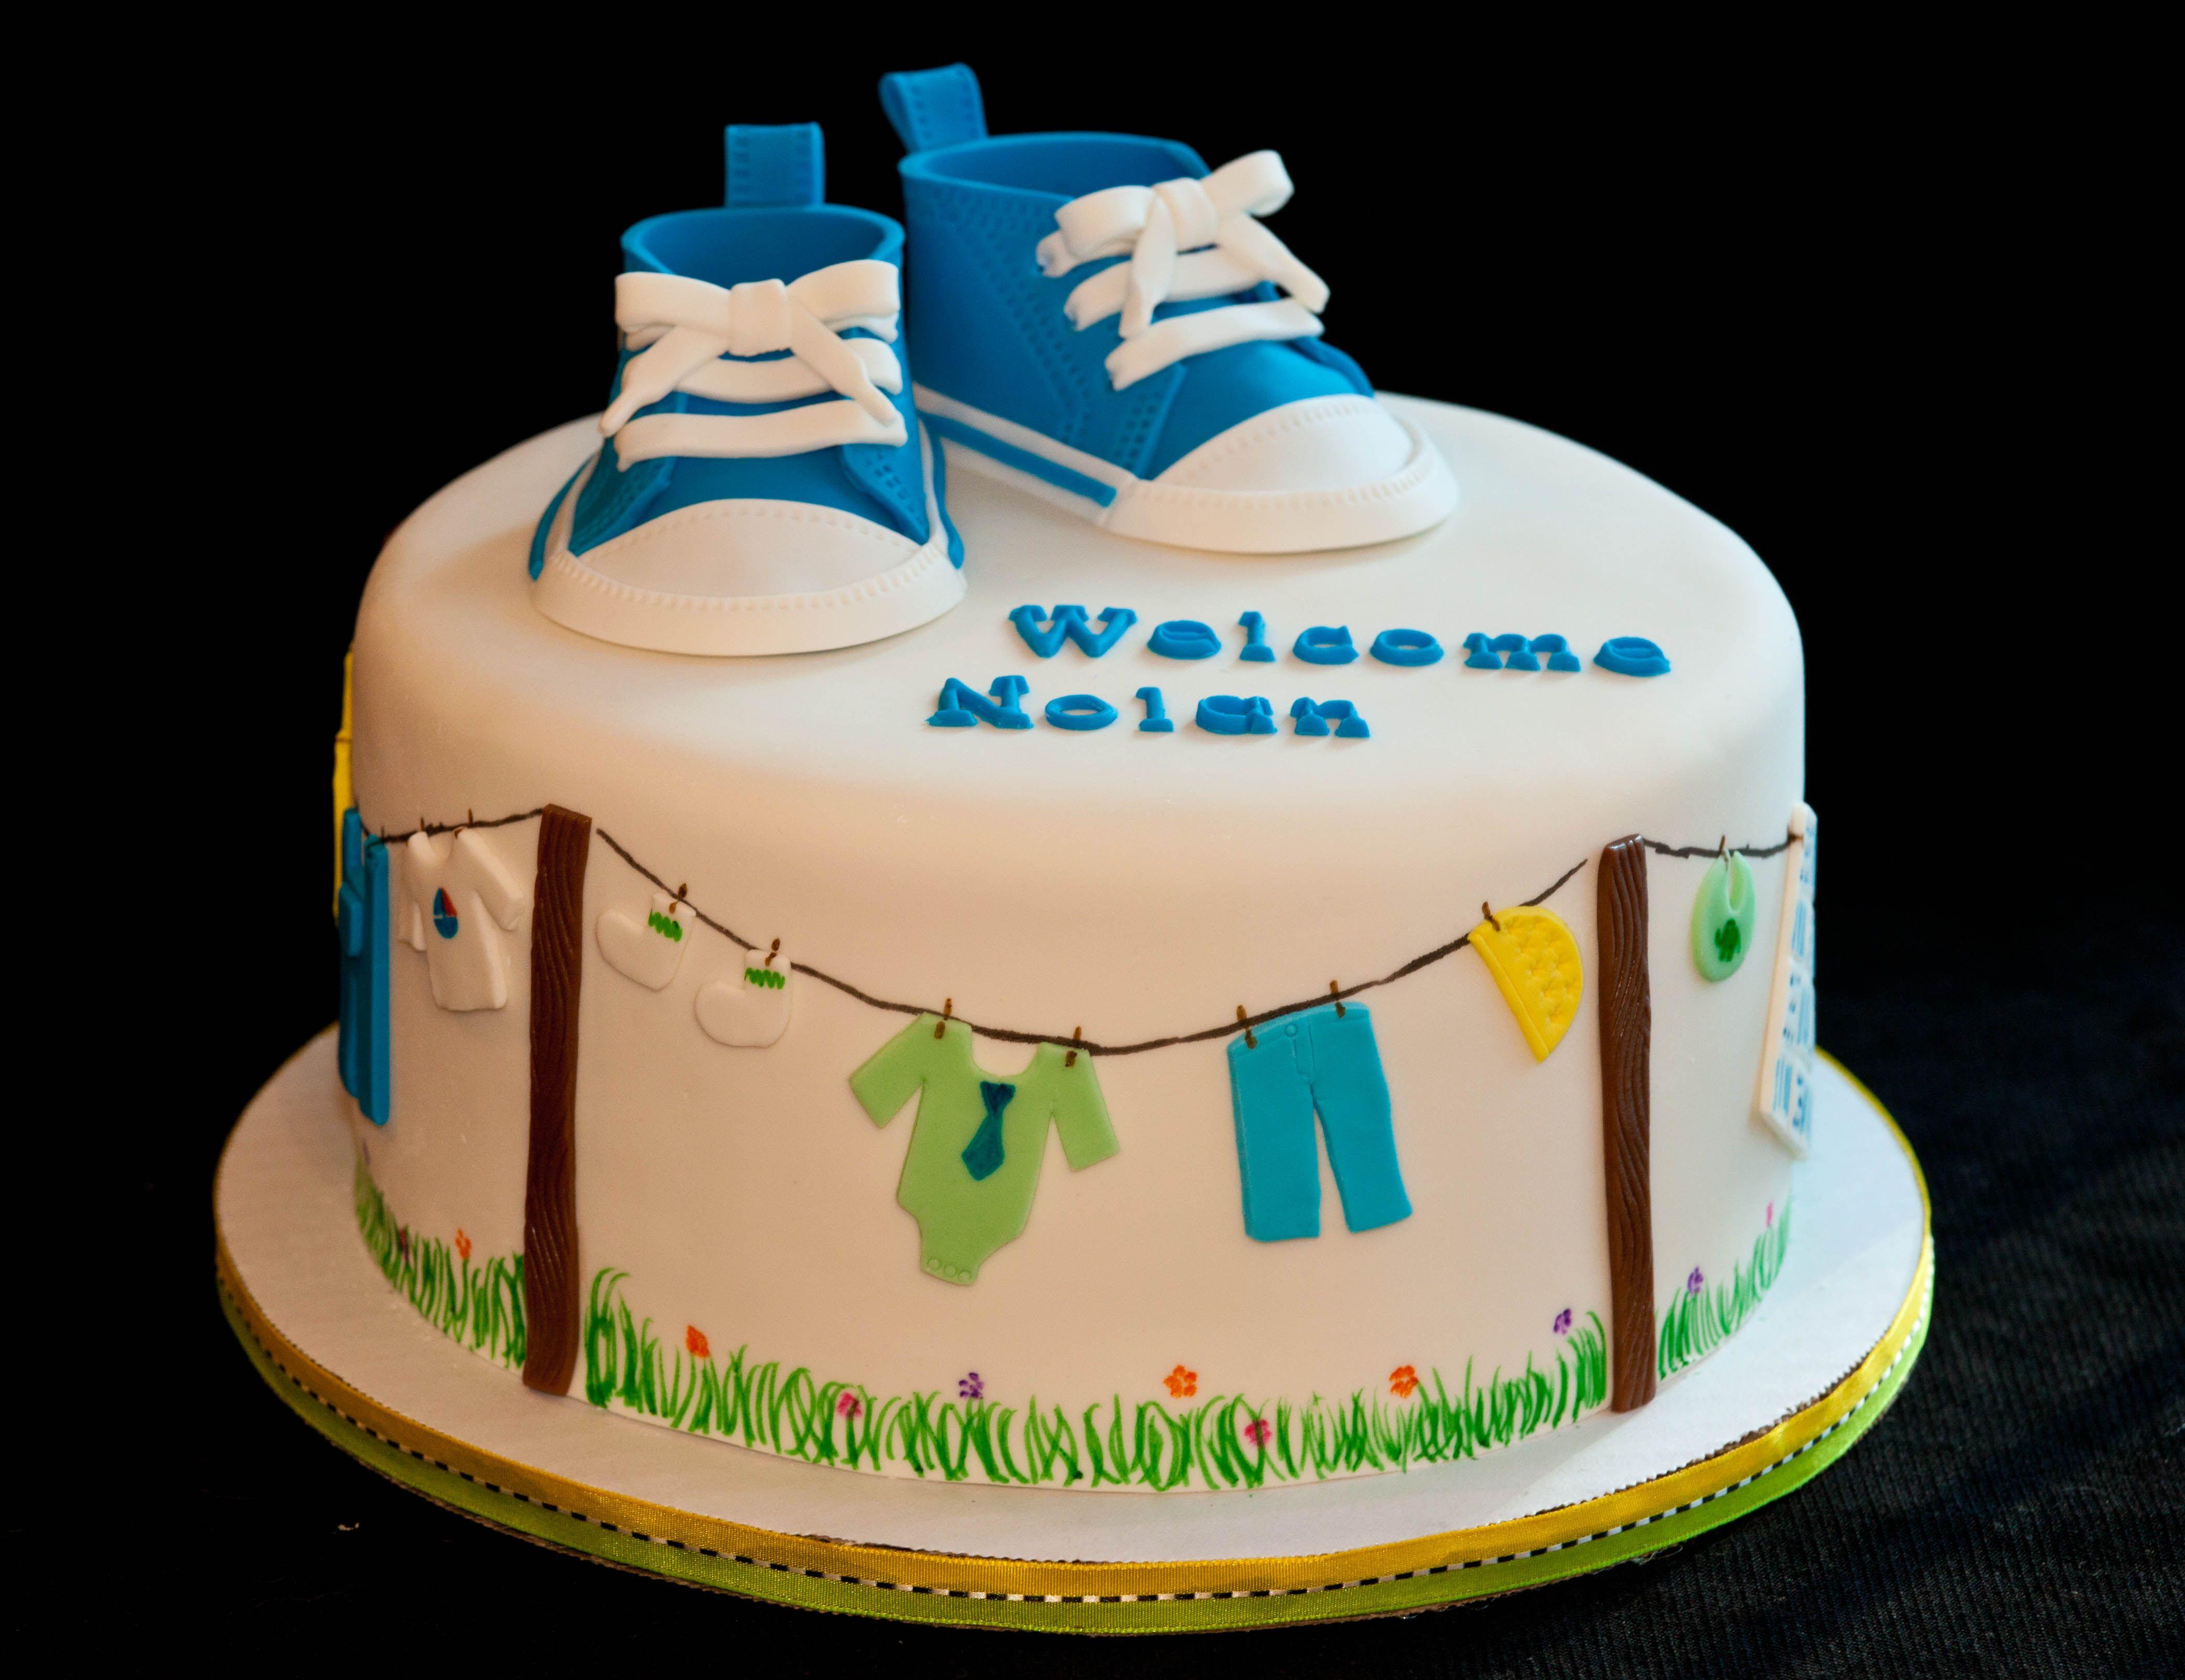 Red Velvet Cake Recipe Kenya: Converse Shoes And Clothesline Cake